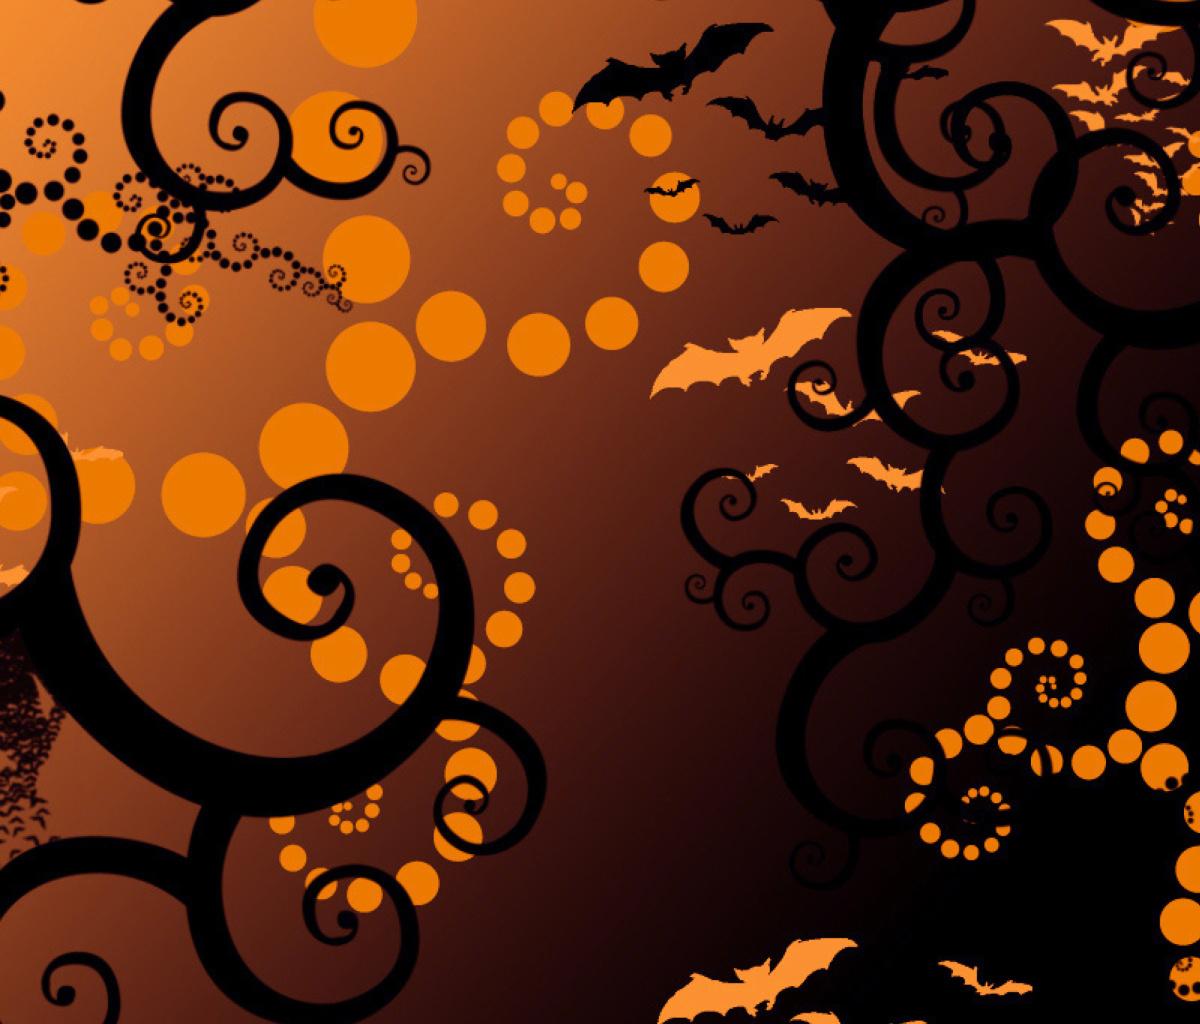 halloween phone wallpaper 11L1 | lyybj